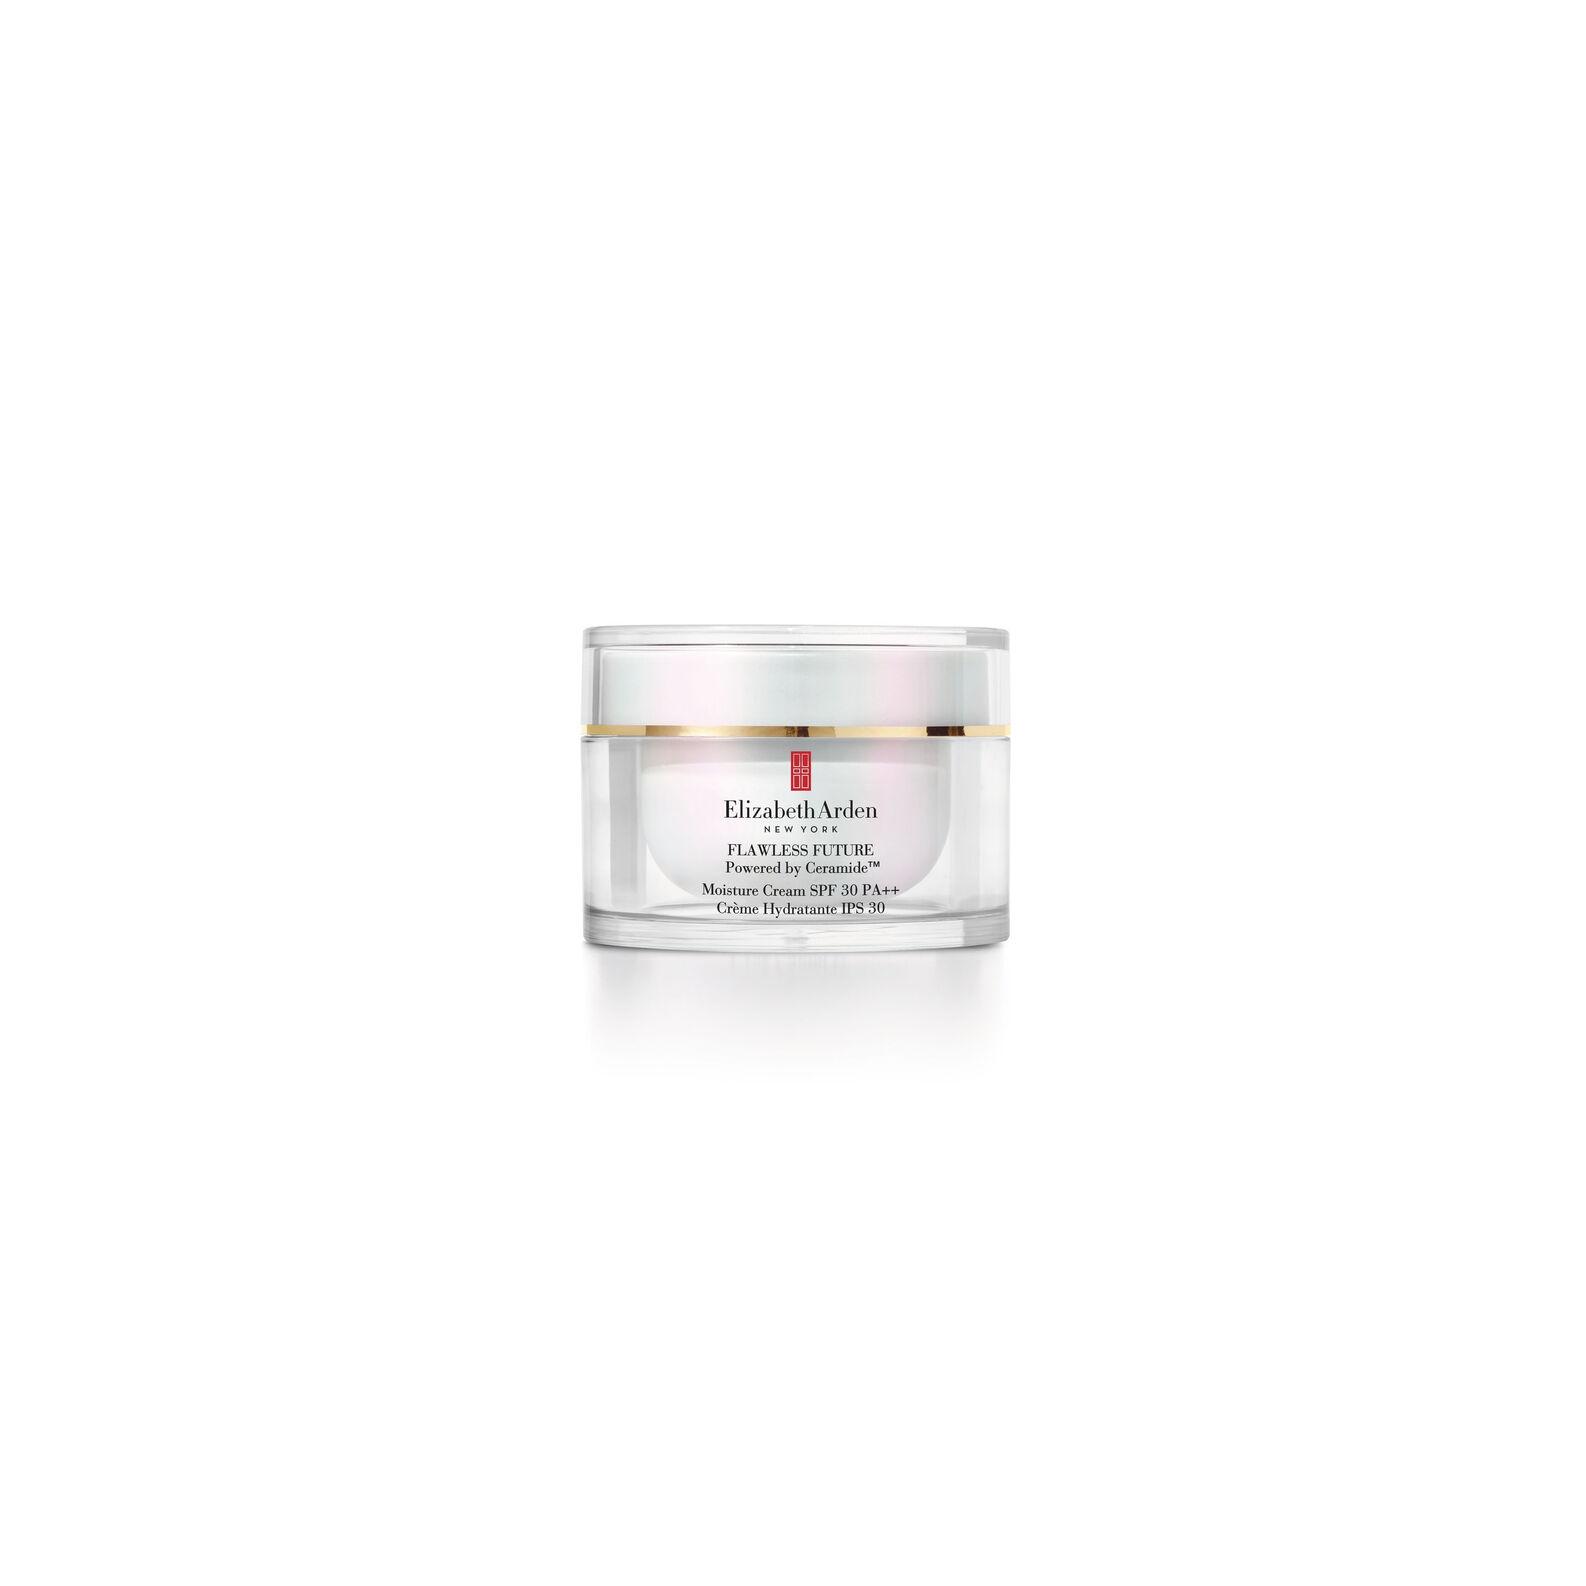 Flawless Future Ceramide SPF 30 Moisture Cream Sunscreen 50 ml